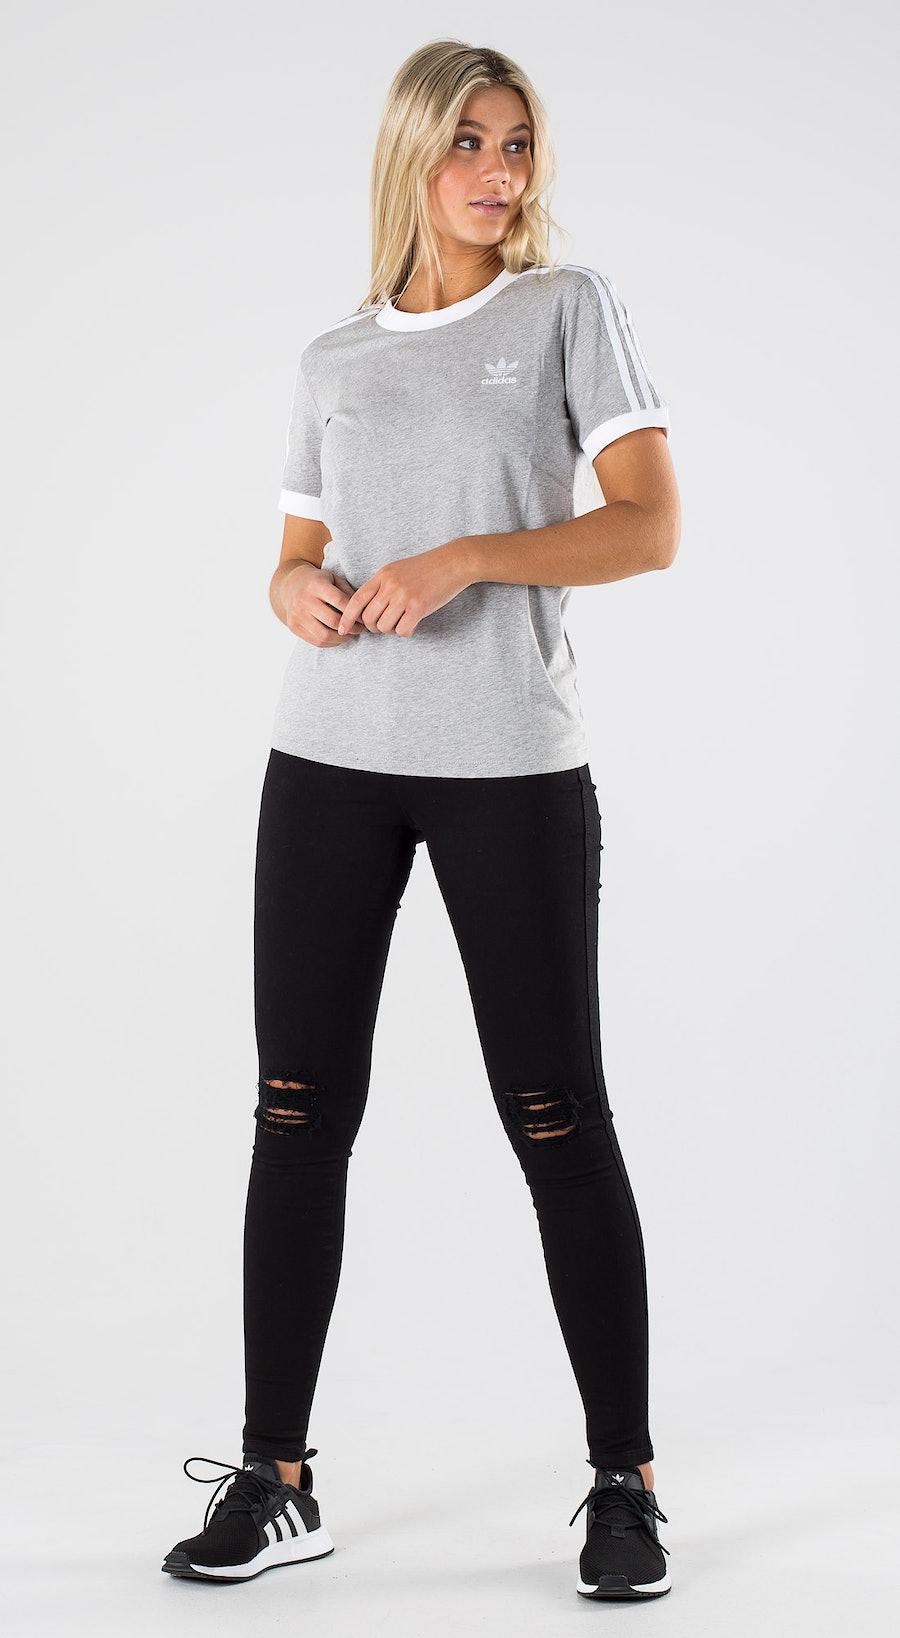 Adidas Originals 3 Str Tee Medium Grey Heather Outfit Multi